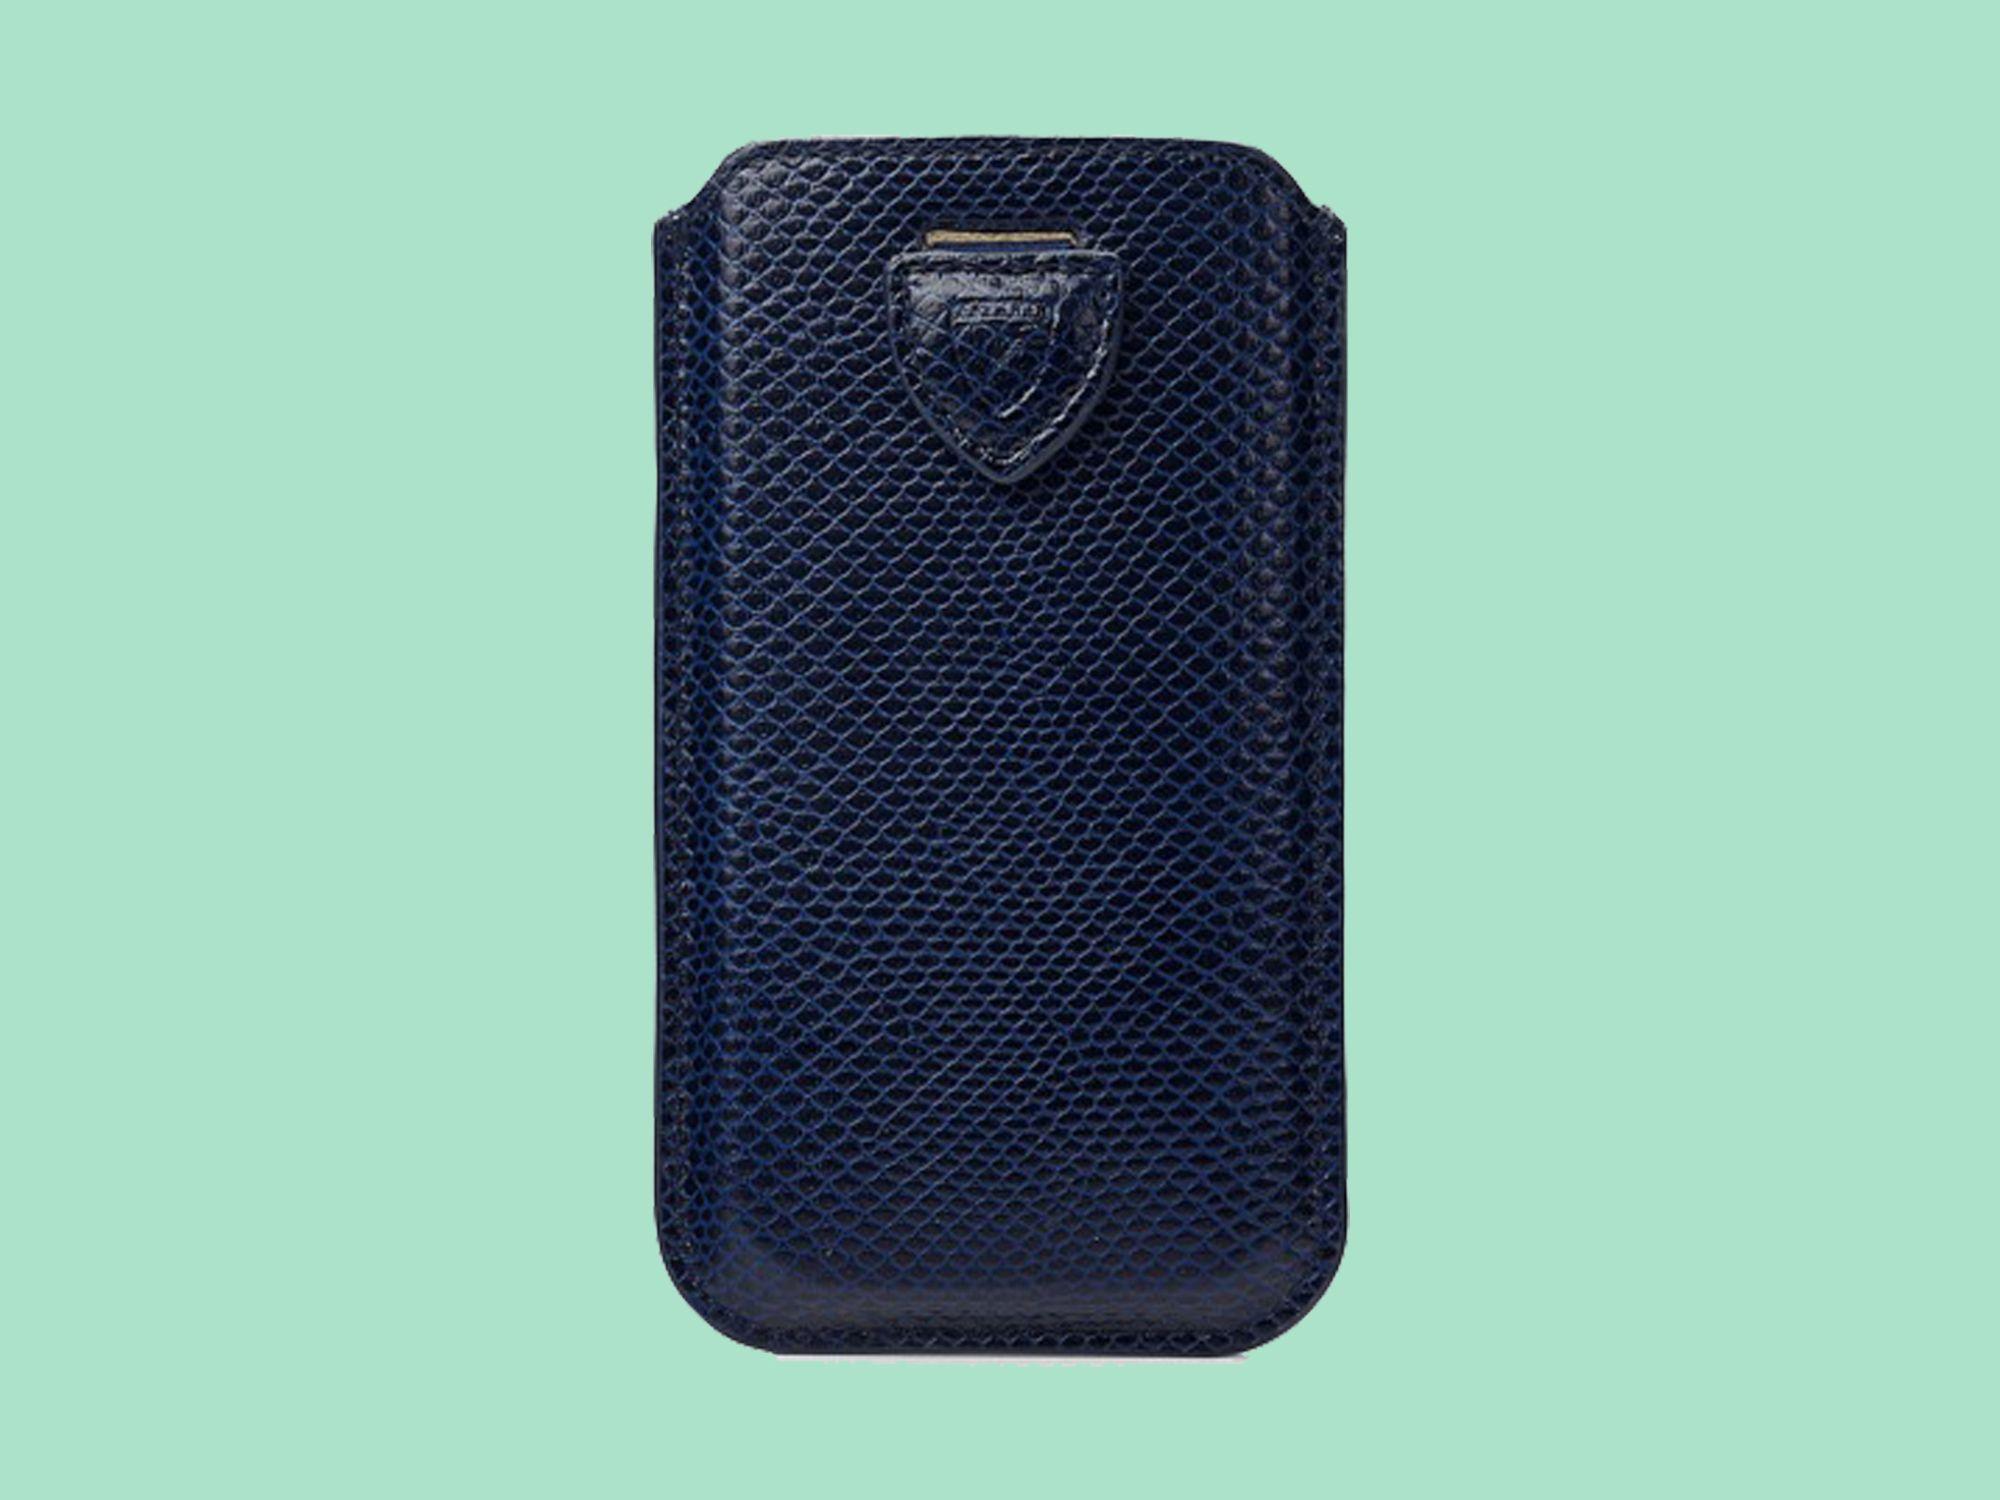 huge discount 0f7b0 677c0 8 Of The Best: Luxury iPhone Cases